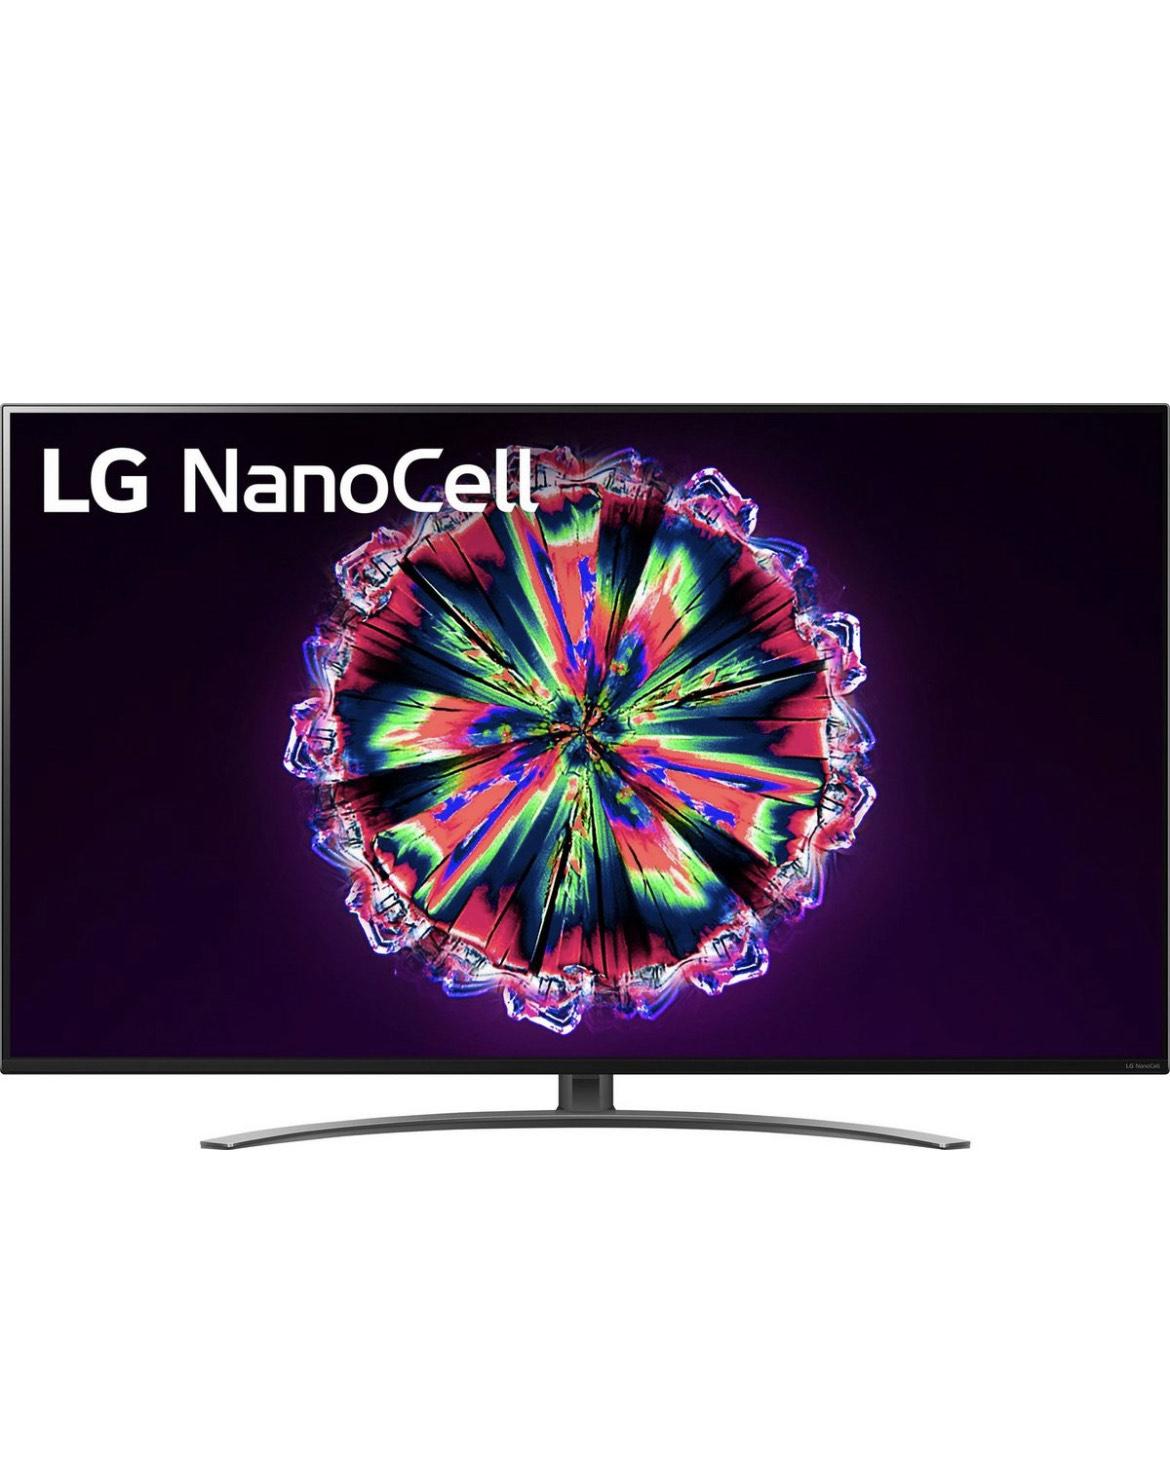 LG 49NANO867NA LED-Fernseher (123 cm/49 Zoll, 4K Ultra HD, Smart-TV, NanoCell, 100Hz Panel, HDMI 2.1)